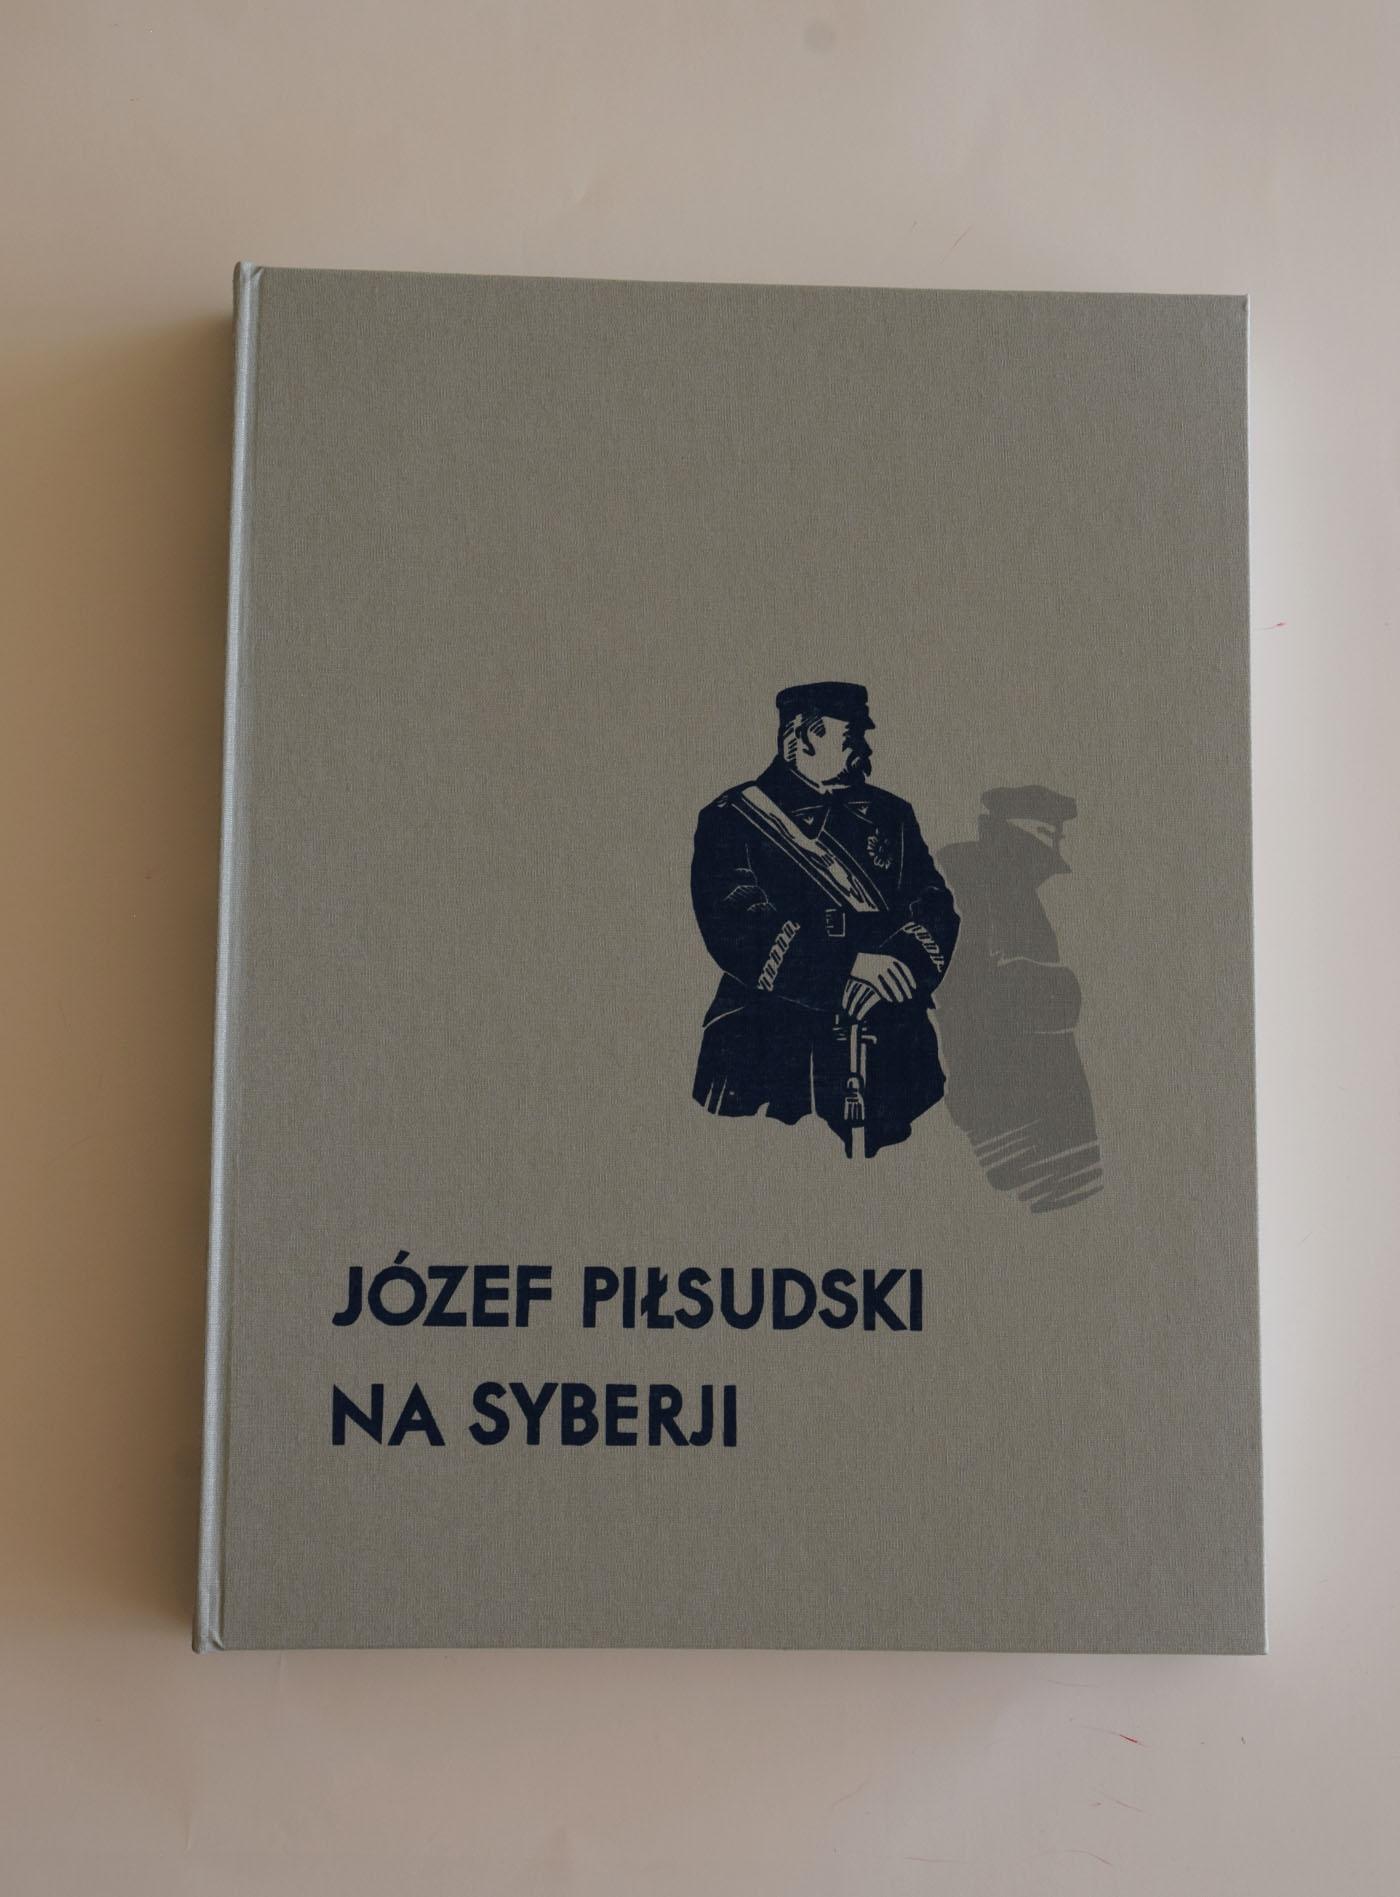 Józef Piłsudski na Syberji